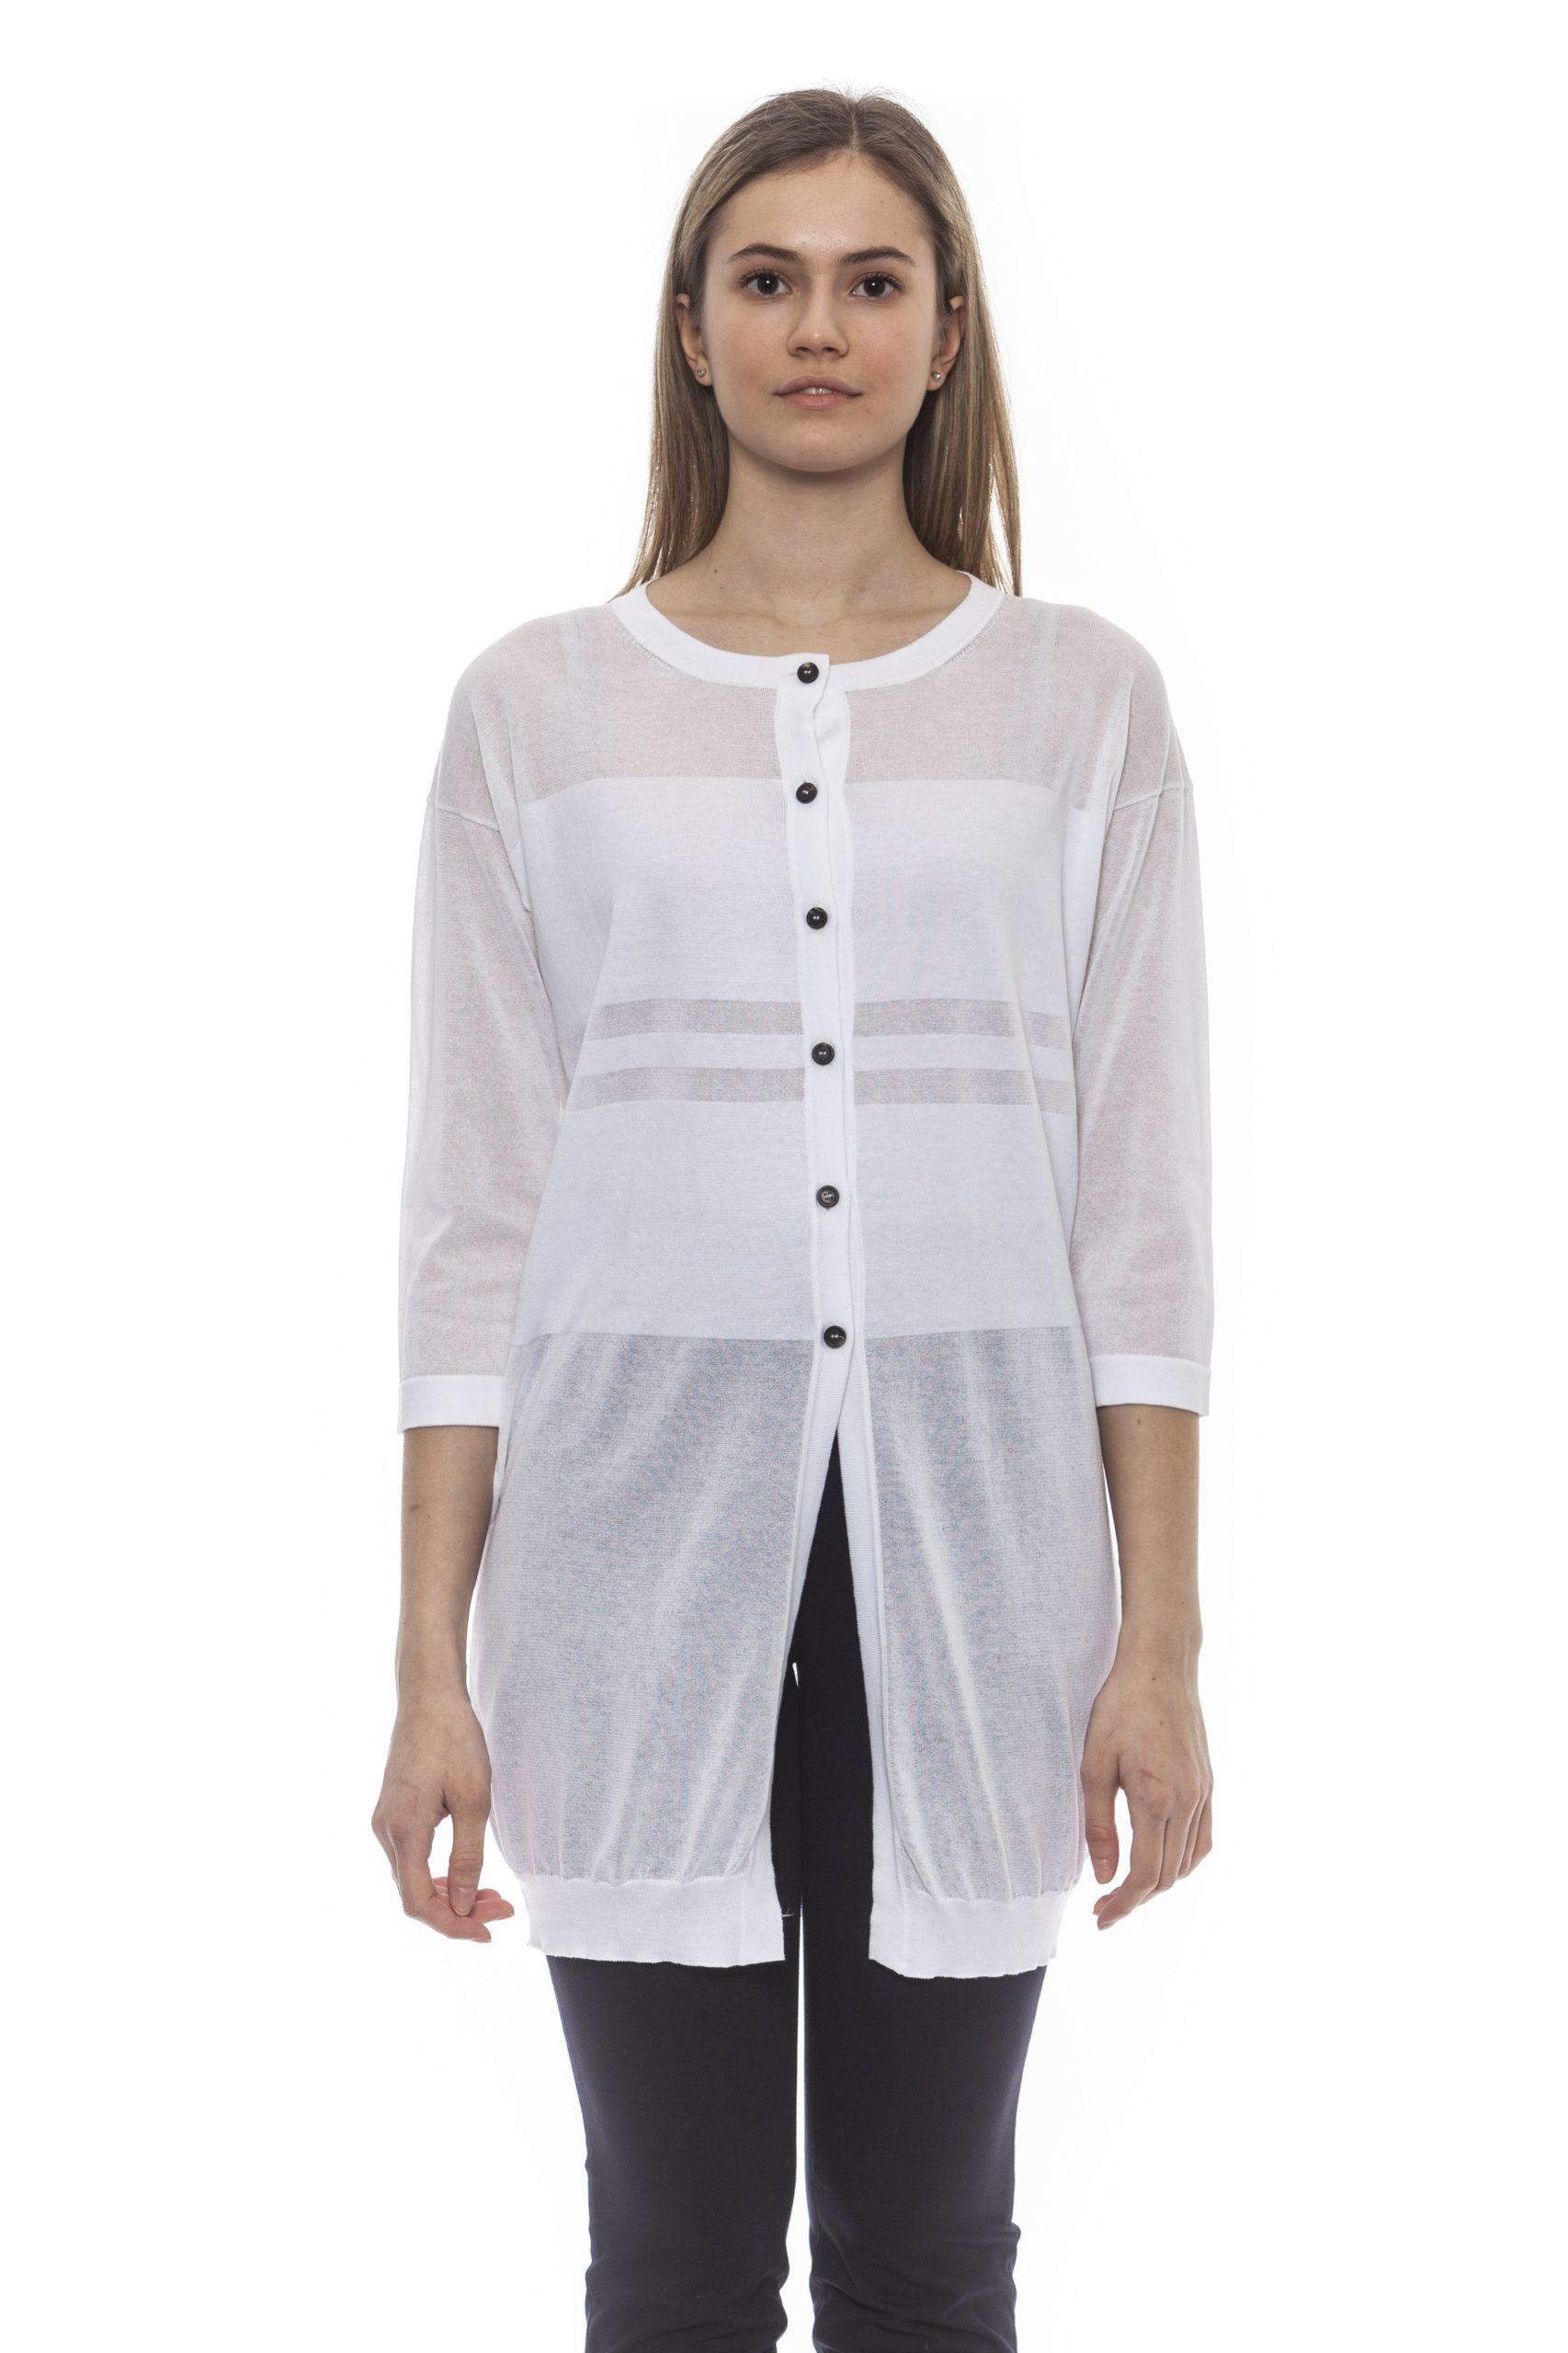 Peserico Women's C Bianco Sweater White PE1383128 - IT42 | S